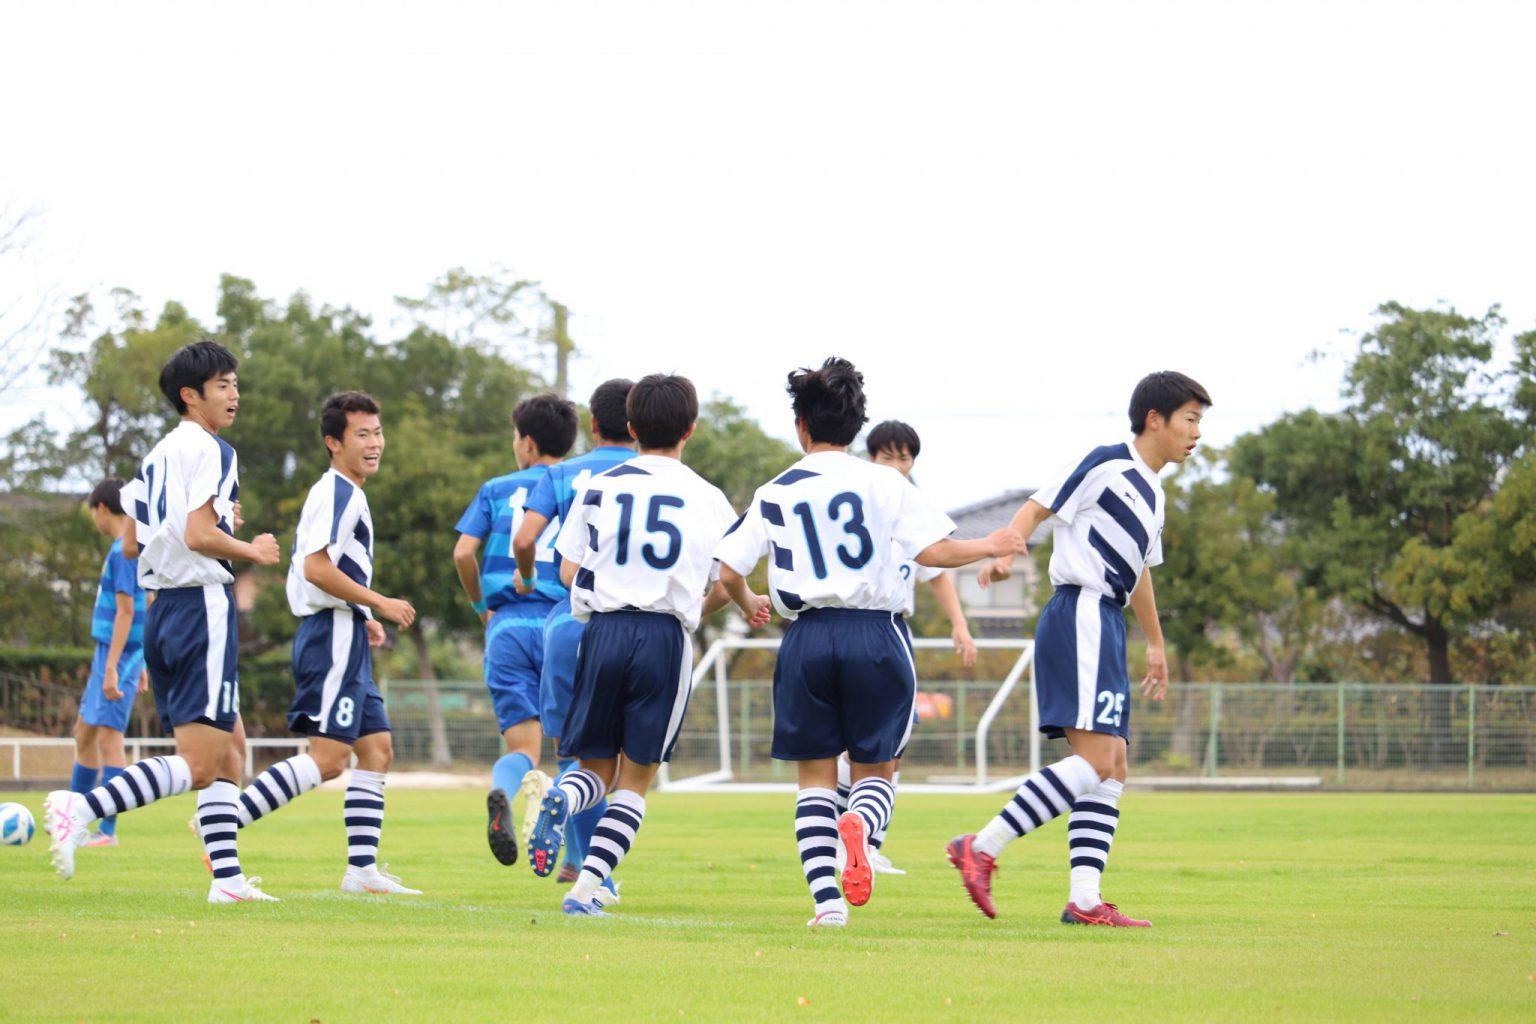 サッカー:新人戦11/21・米子松蔭戦 試合結果